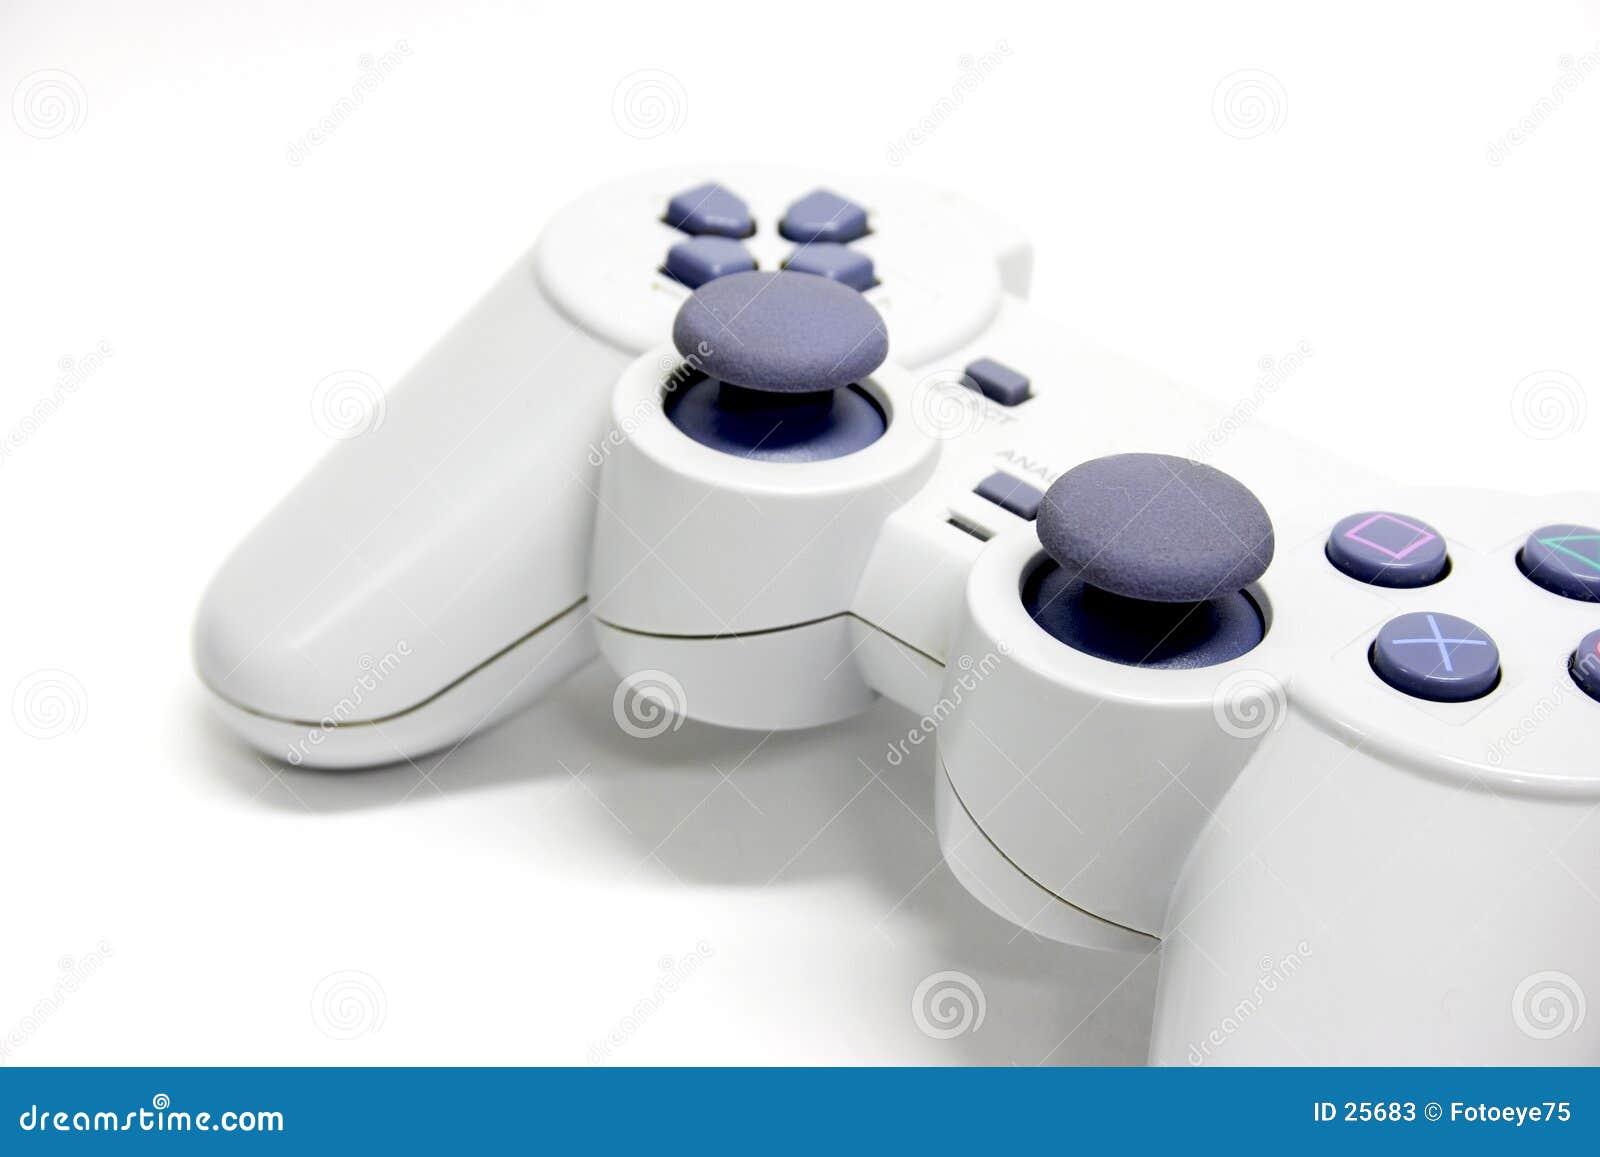 Contrôleur de jeu